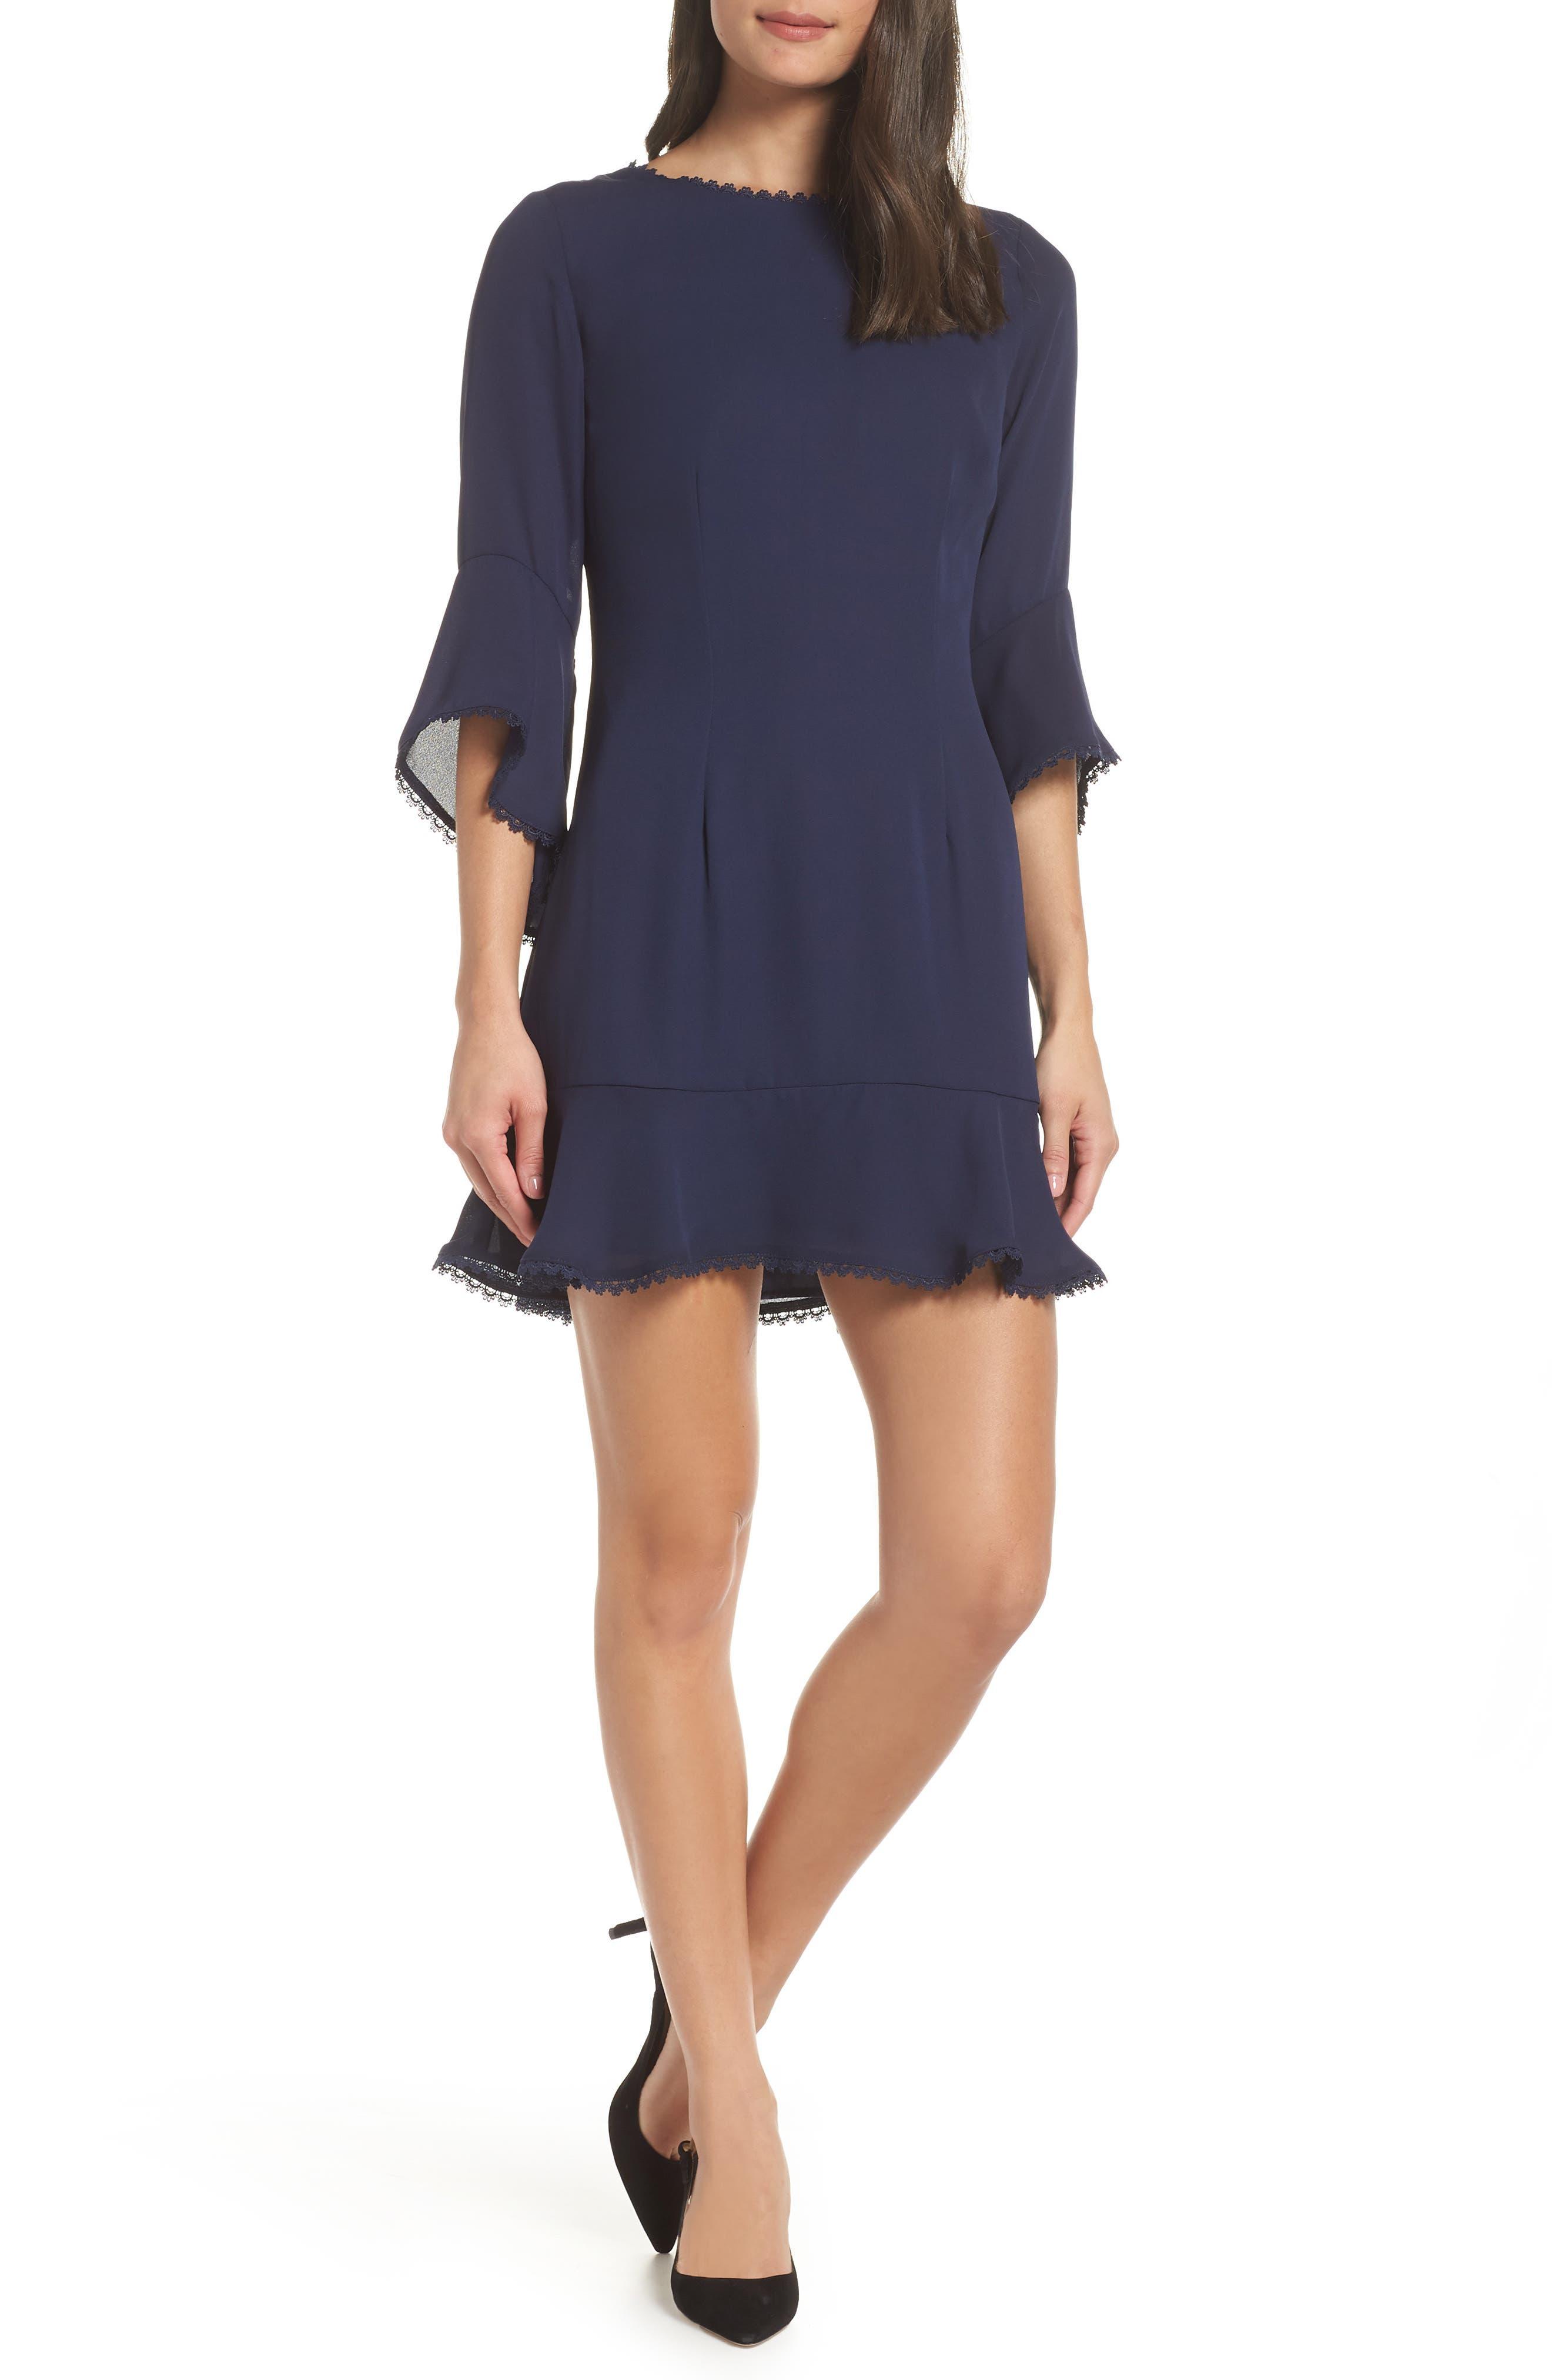 Bb Dakota Flounce Hem Crepe Dress, Black